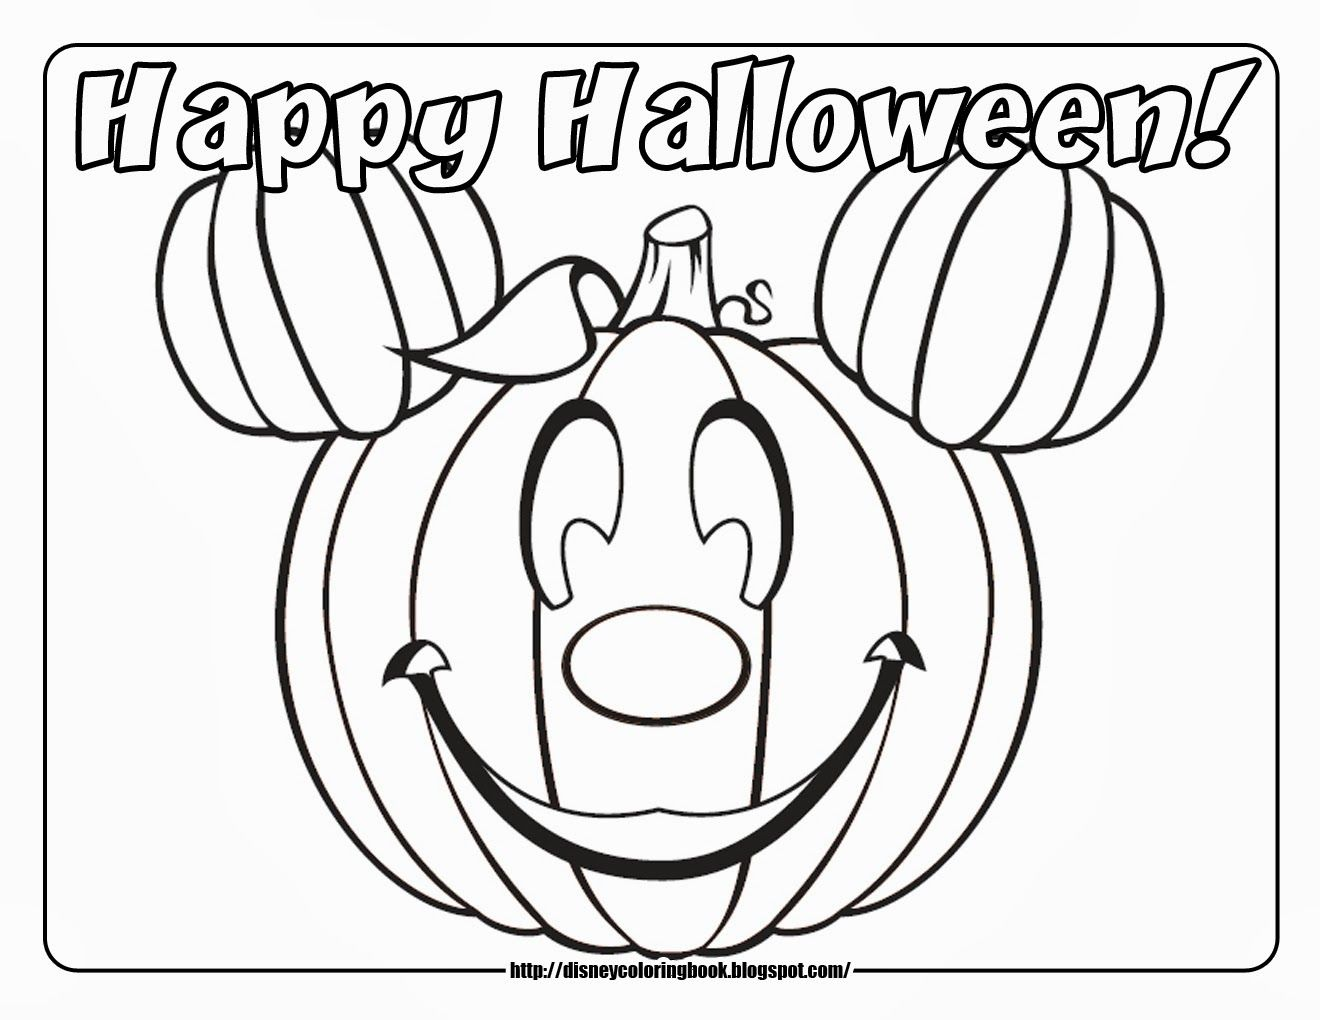 Happy Halloween Mickey Mouse Pumpkin Printing Tip I